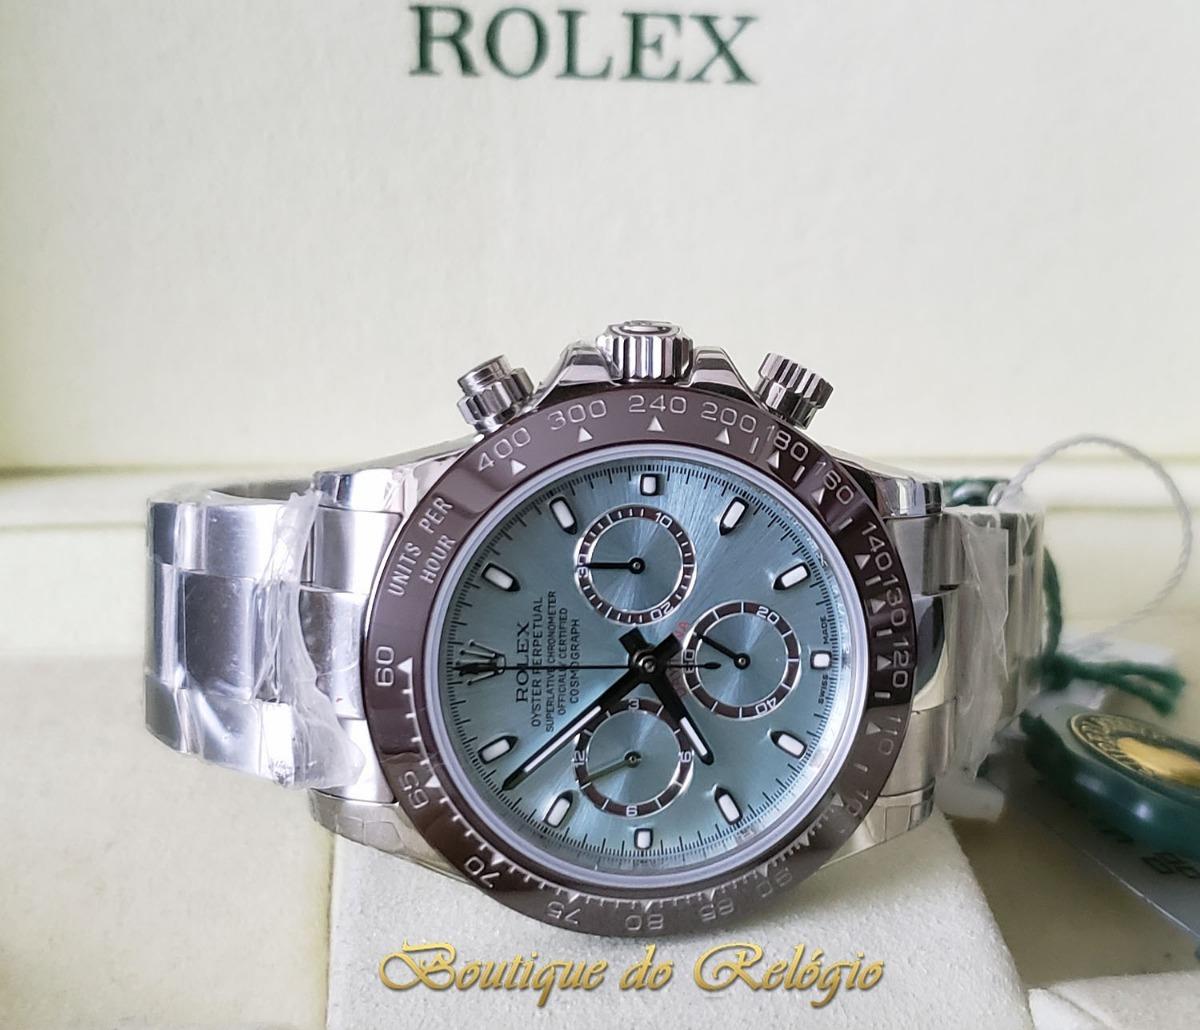 af461856832 Relógio Eta Novo - Modelo Daytona Ice Blue - Jh Best A4130 - R ...